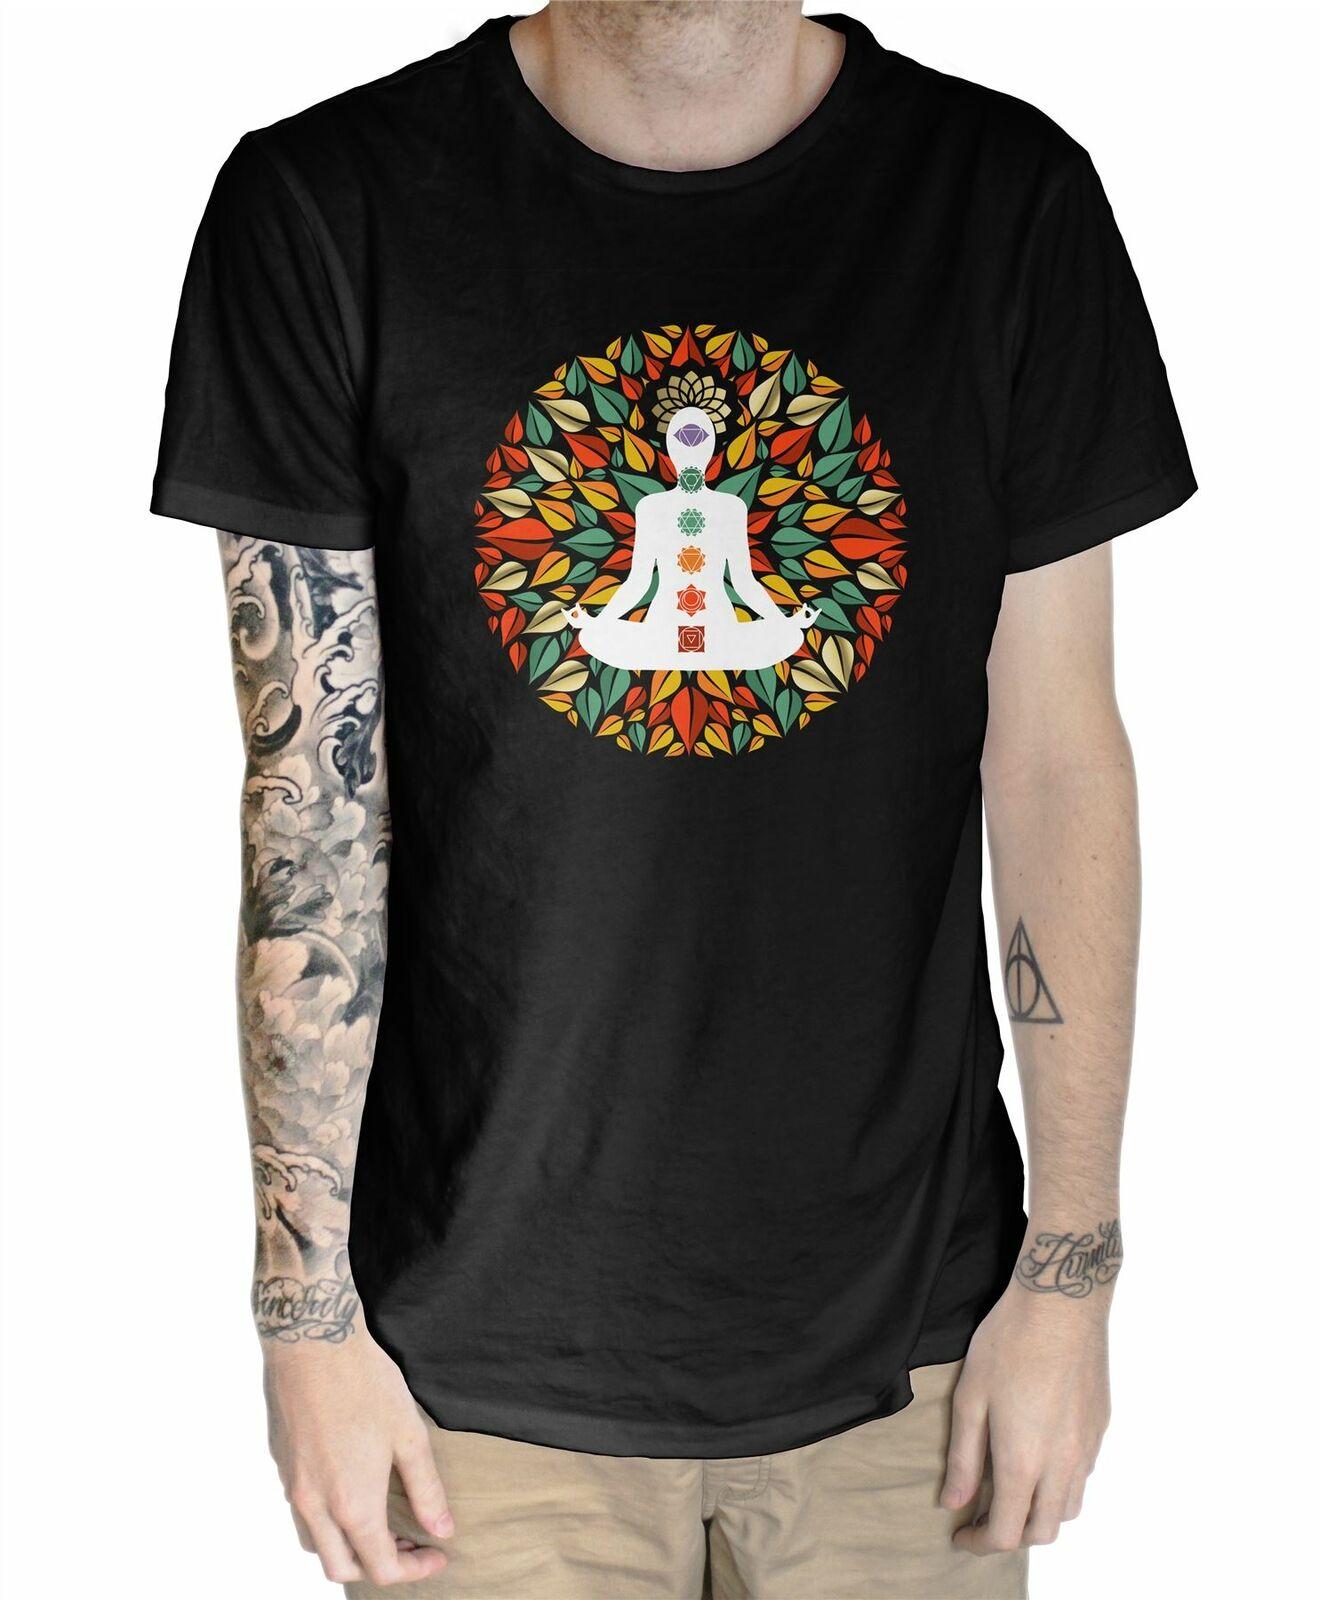 Мужская футболка с лепестками чакр Мандала Йога Медитация|Футболки| | АлиЭкспресс